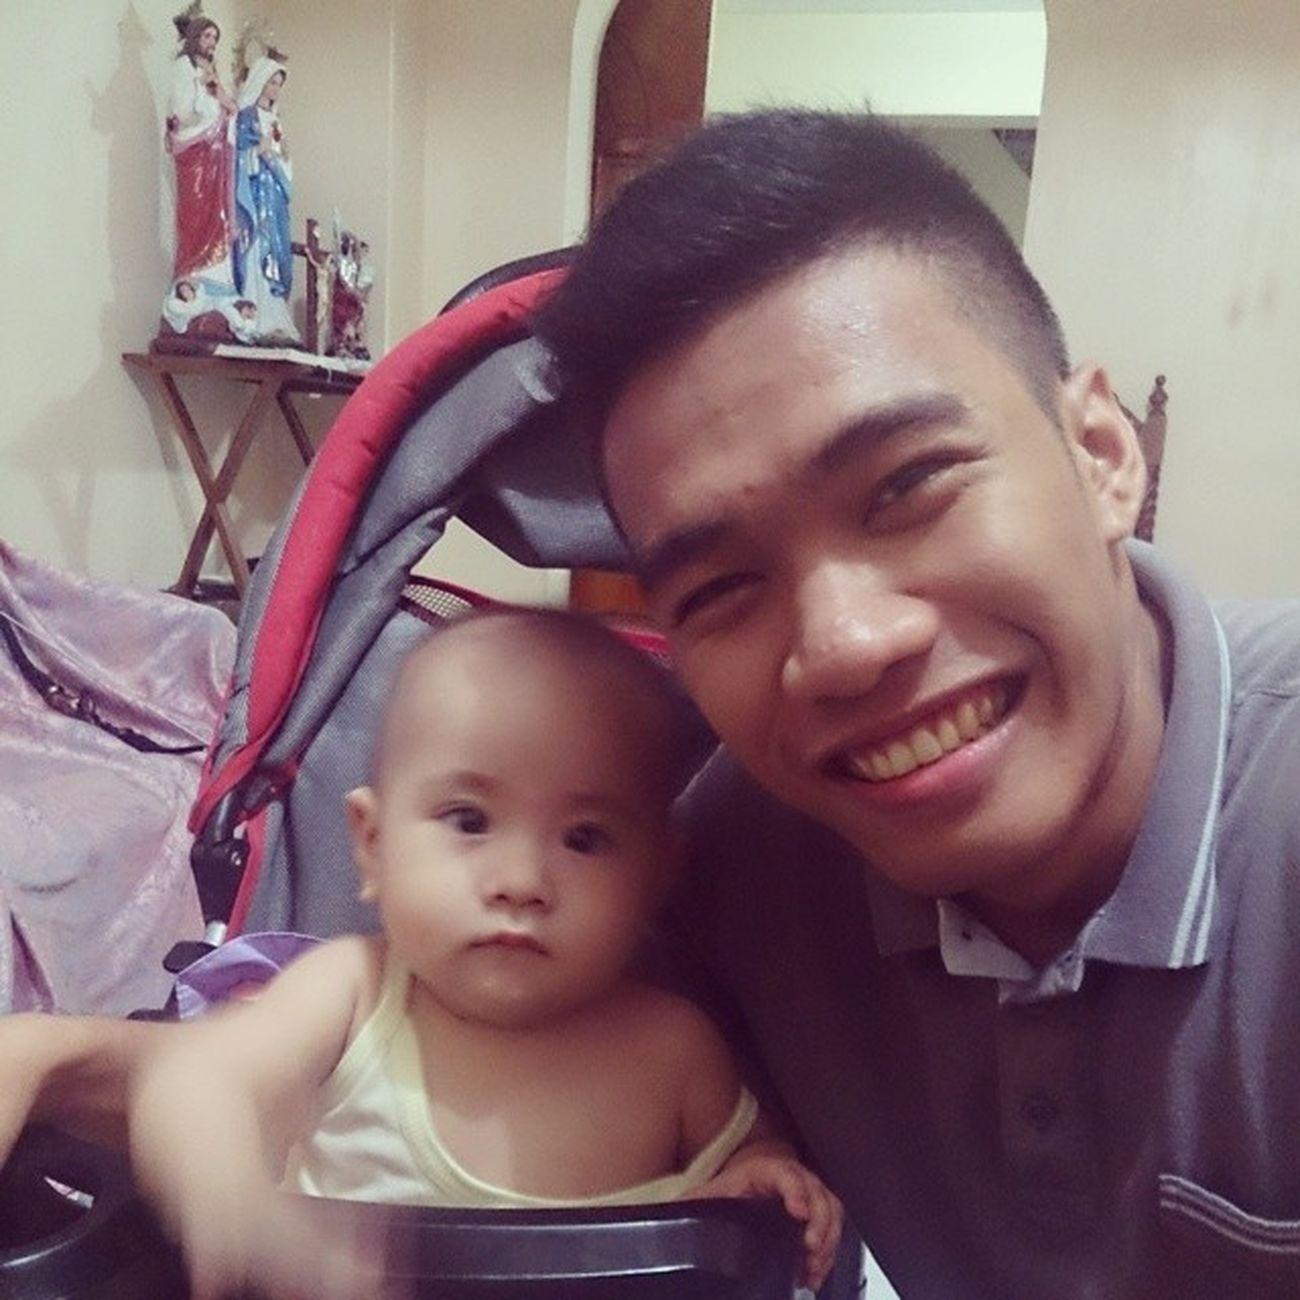 This cutie patootieeeee. :-) Babytoni Cousin